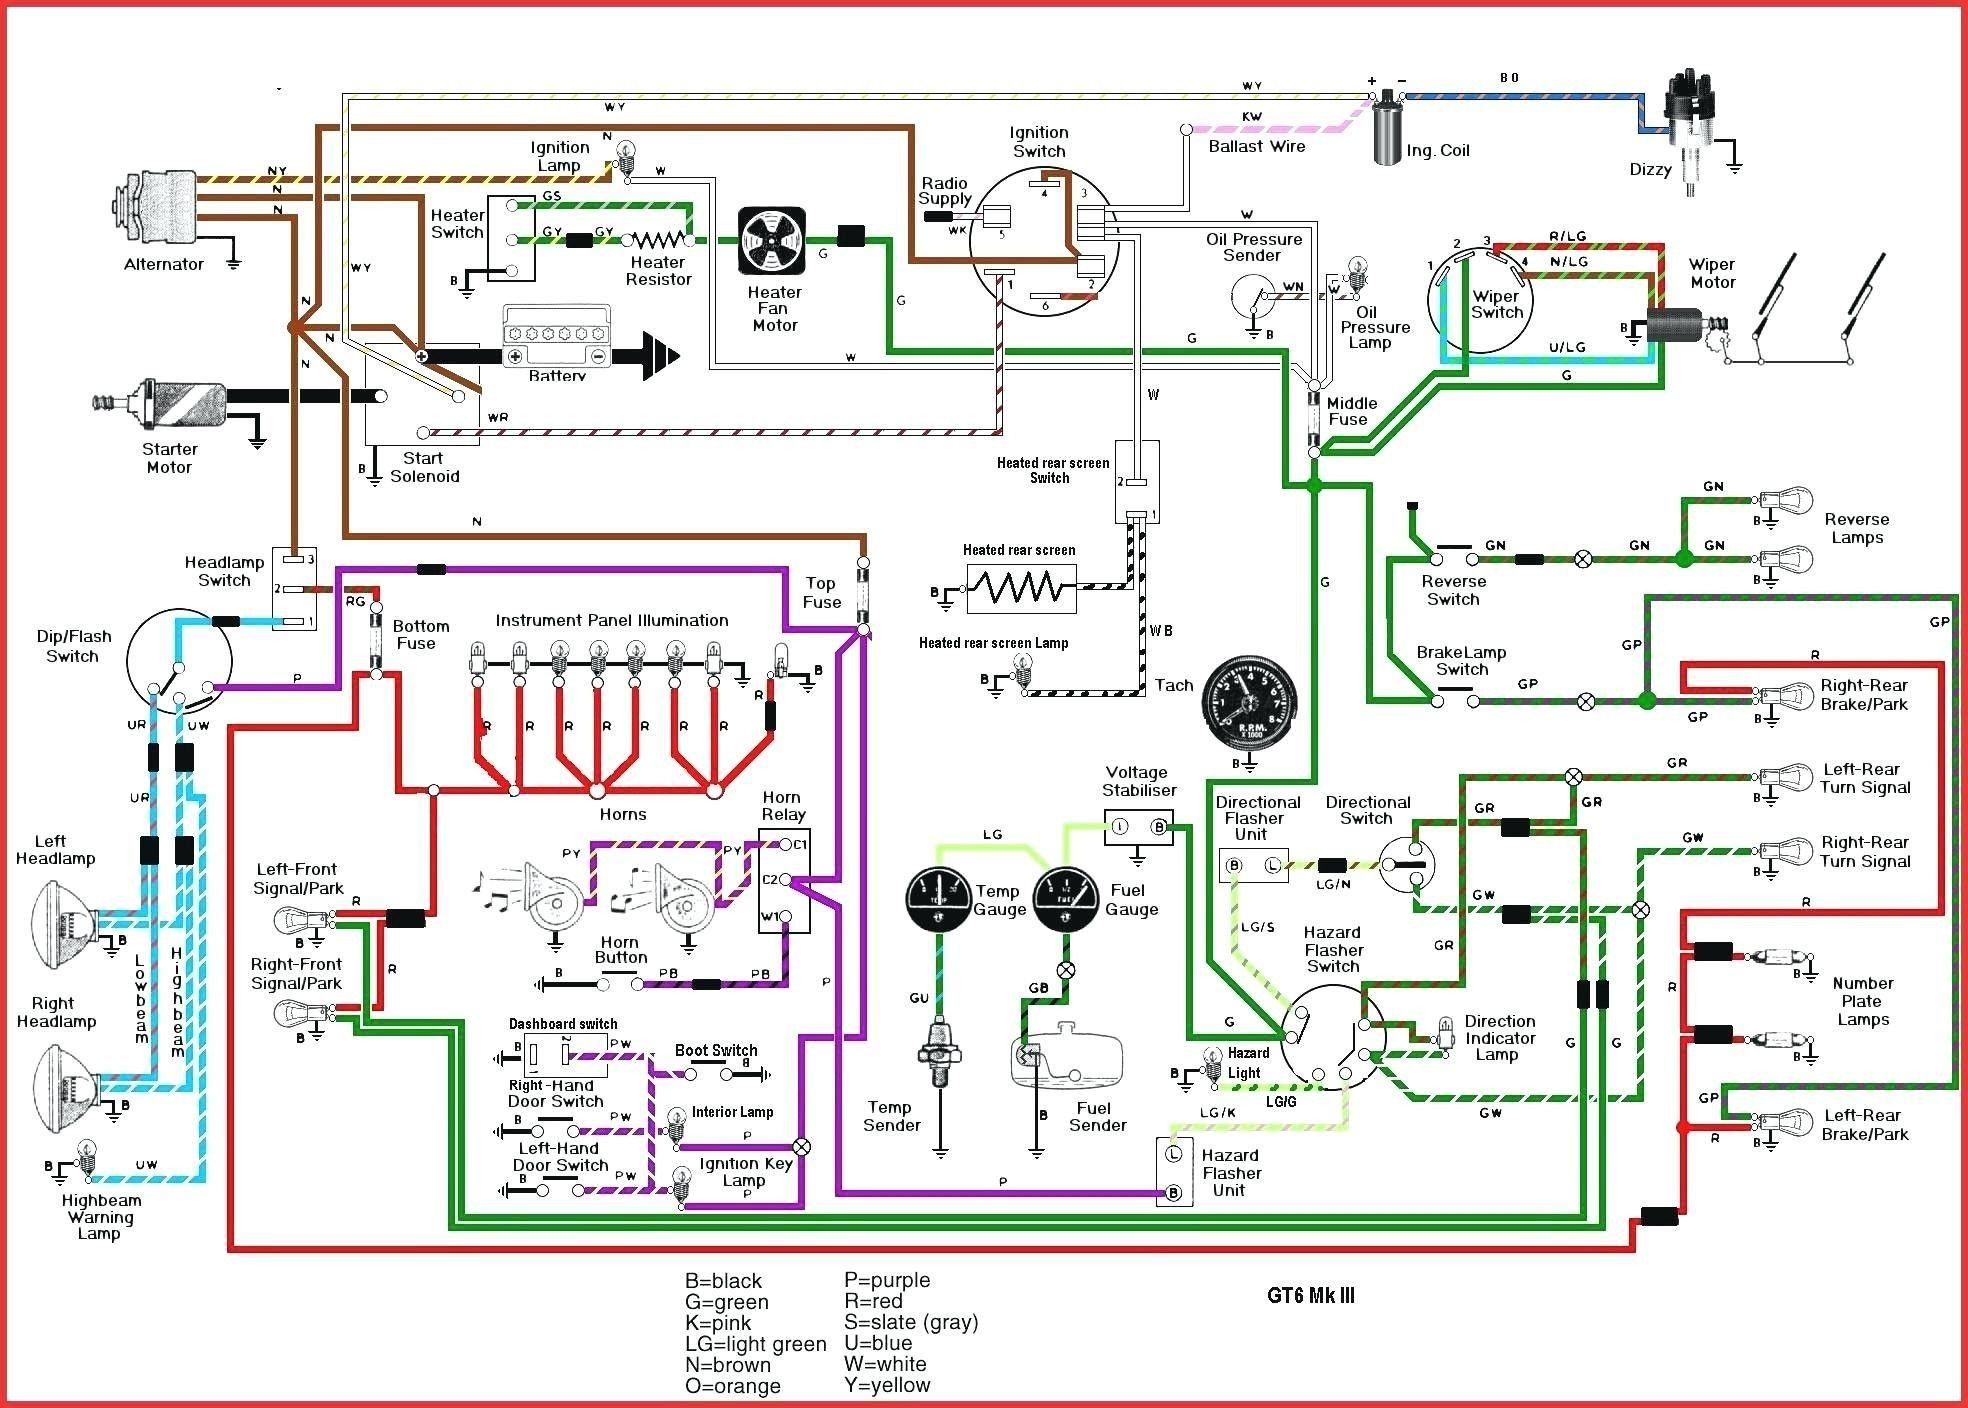 New Household Electric Circuit #diagram #wiringdiagram #diagramming  #Diagramm #visuals #visual… (With images) | Electrical circuit diagram,  Home electrical wiring, Diagram designPinterest